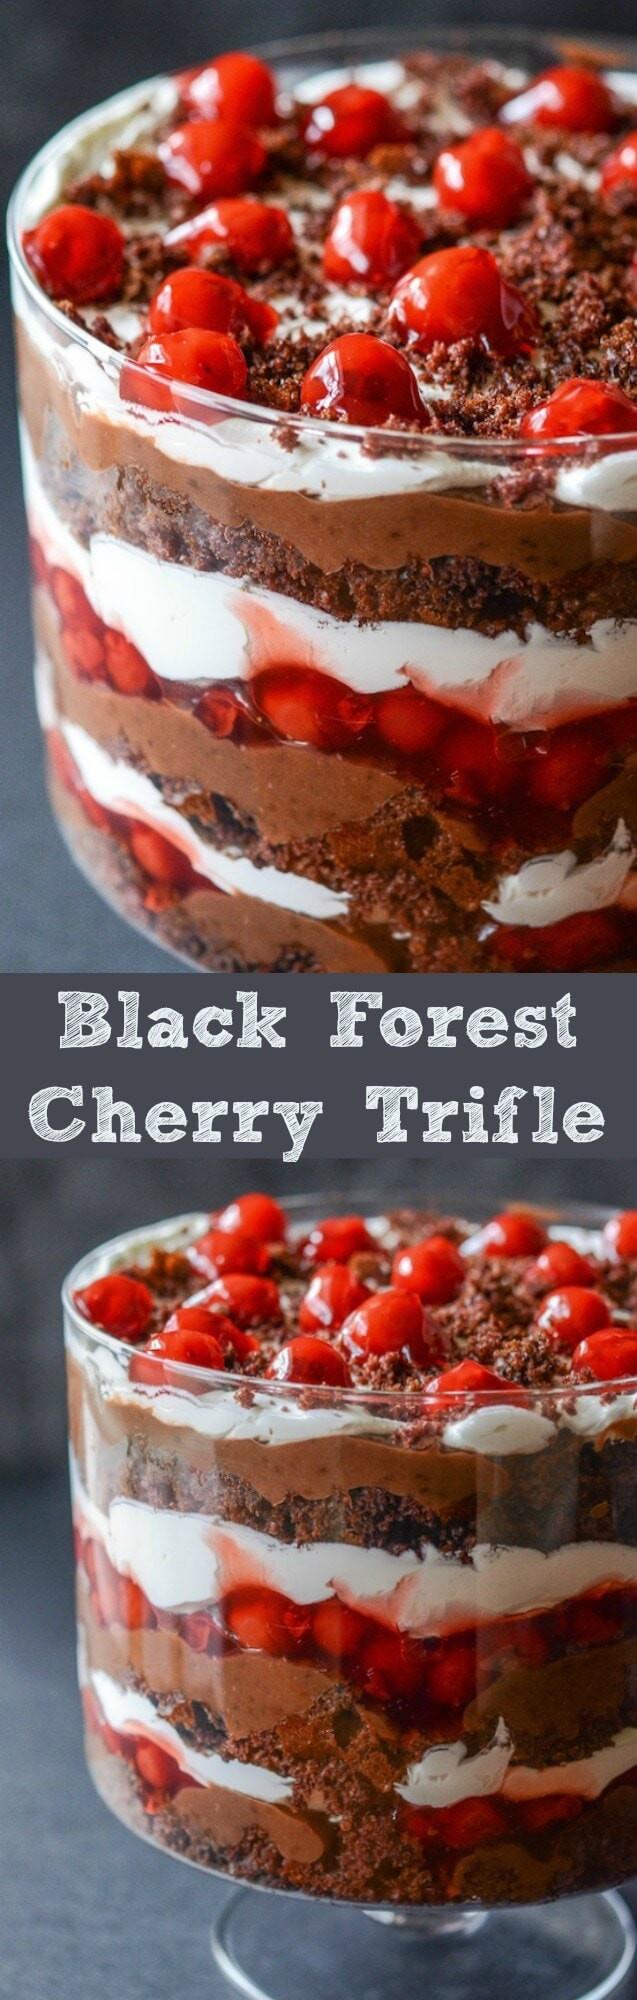 Chocolate Cherry Dessert  chocolate cherry trifle dessert